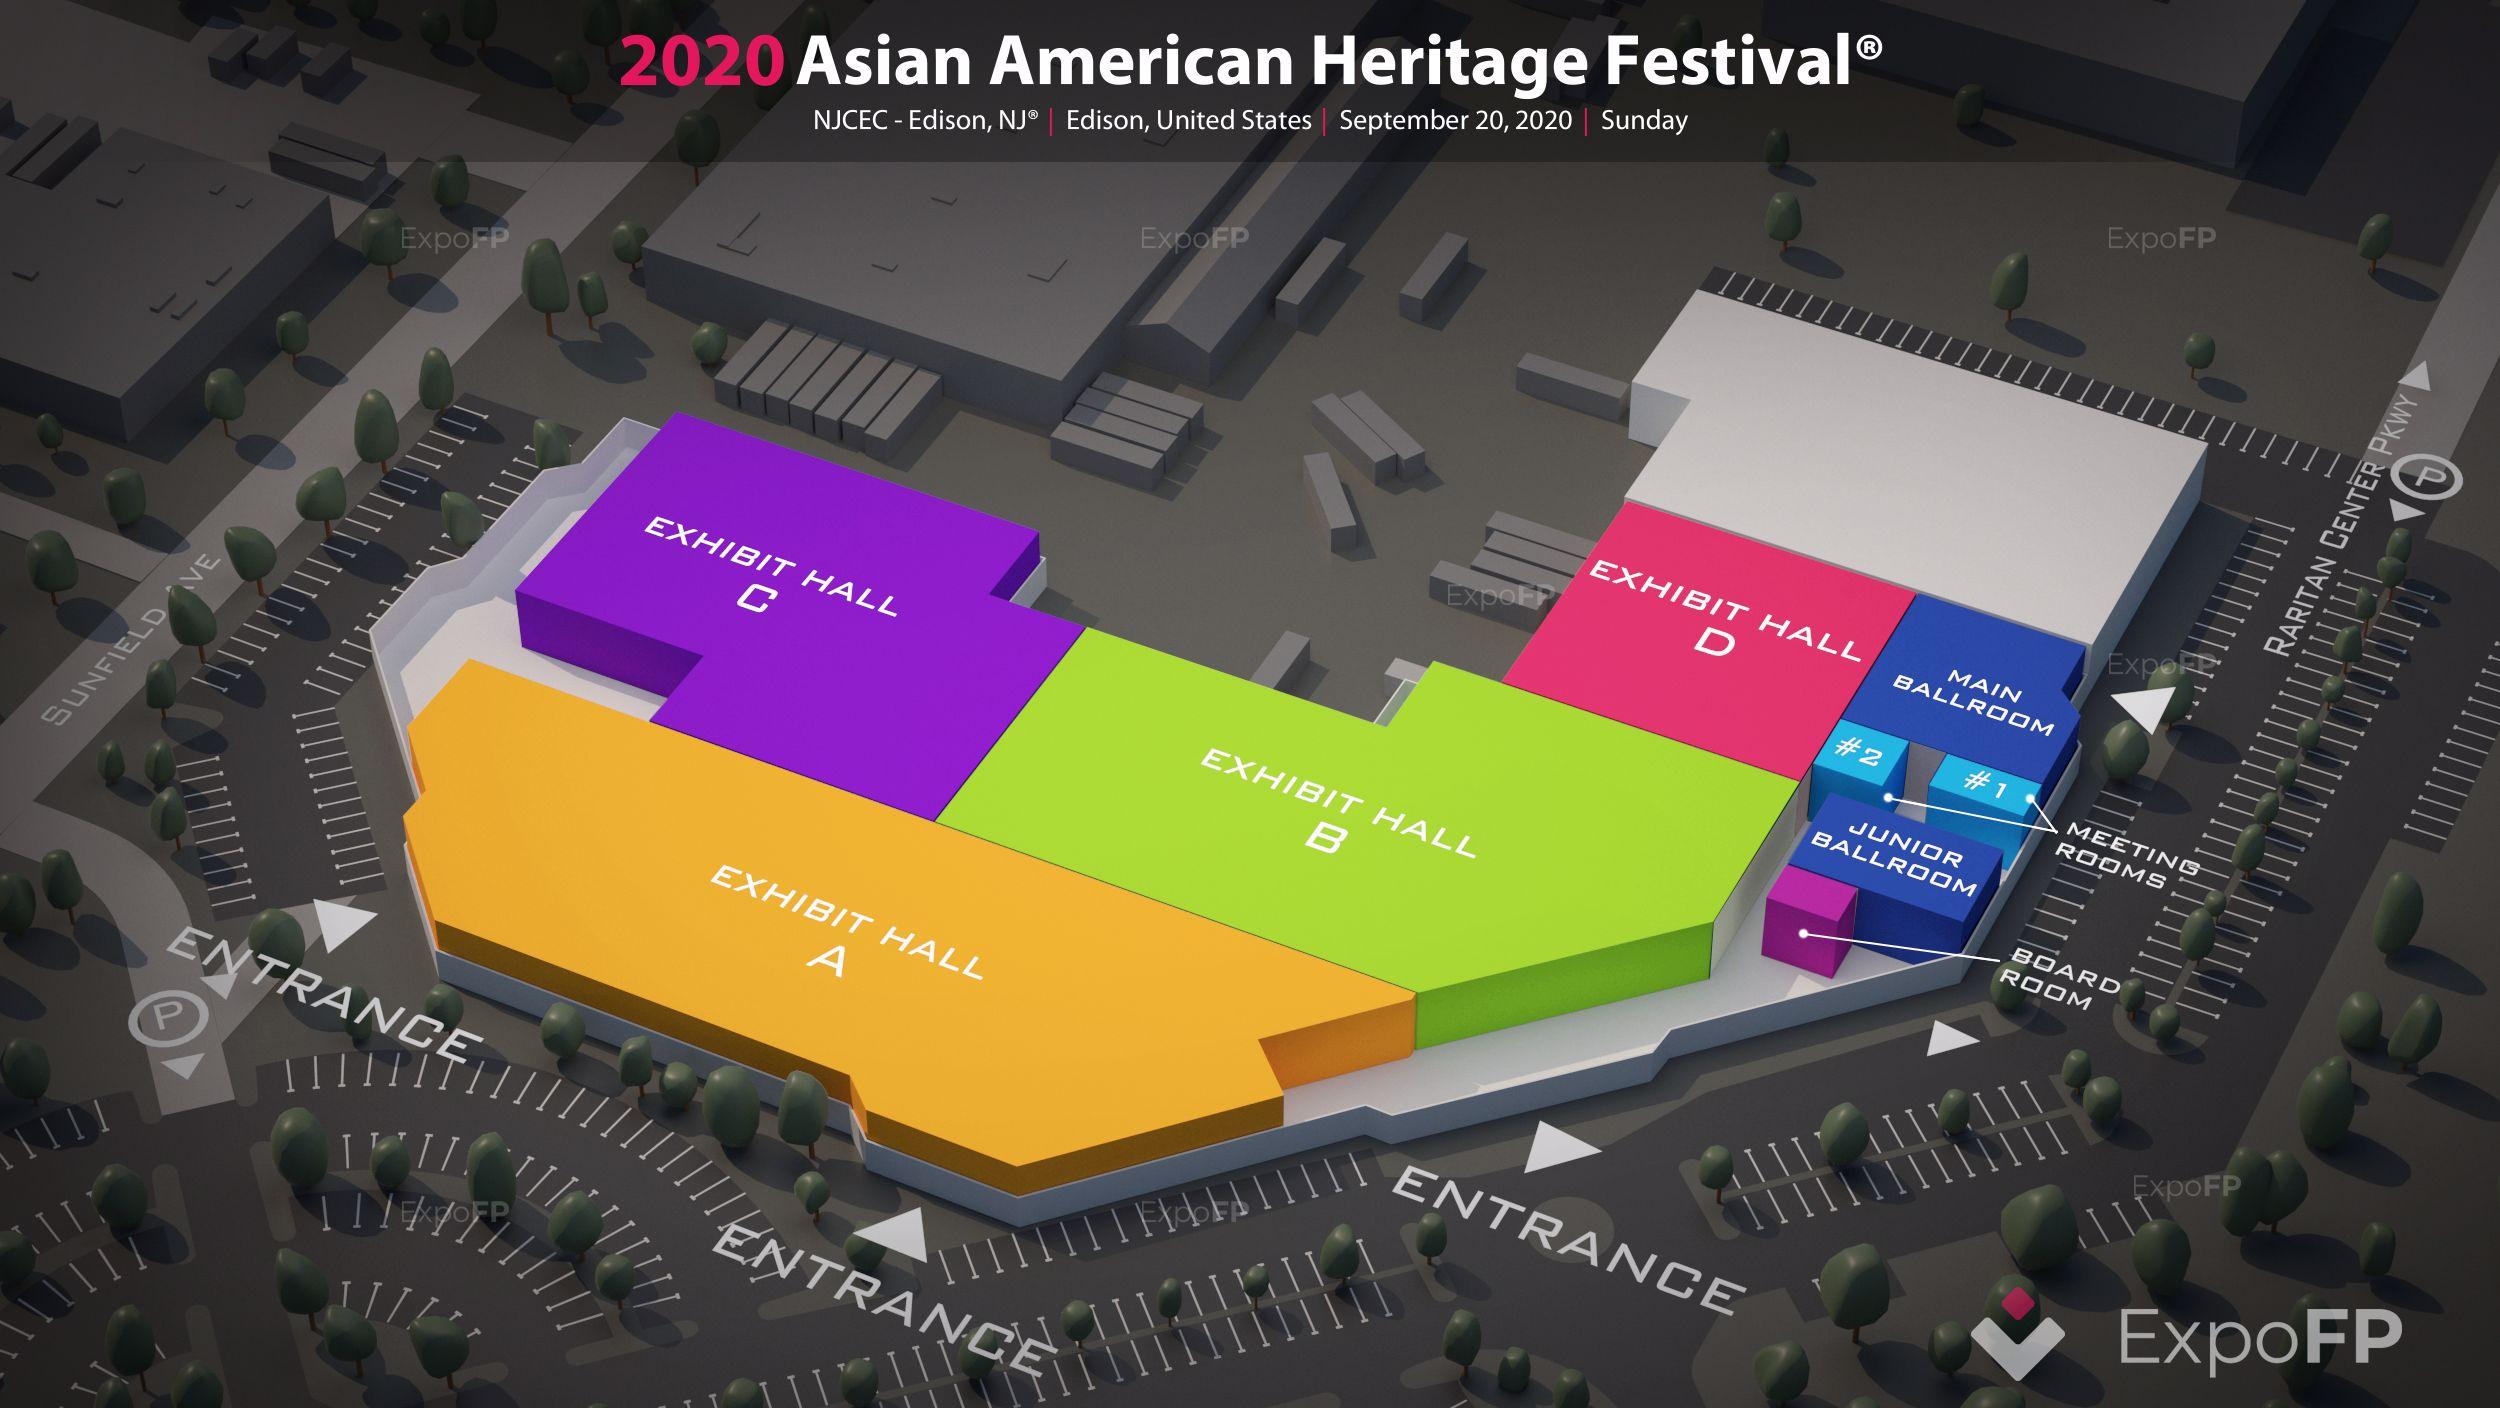 Asian Festival 2020.Asian American Heritage Festival 2020 In Njcec